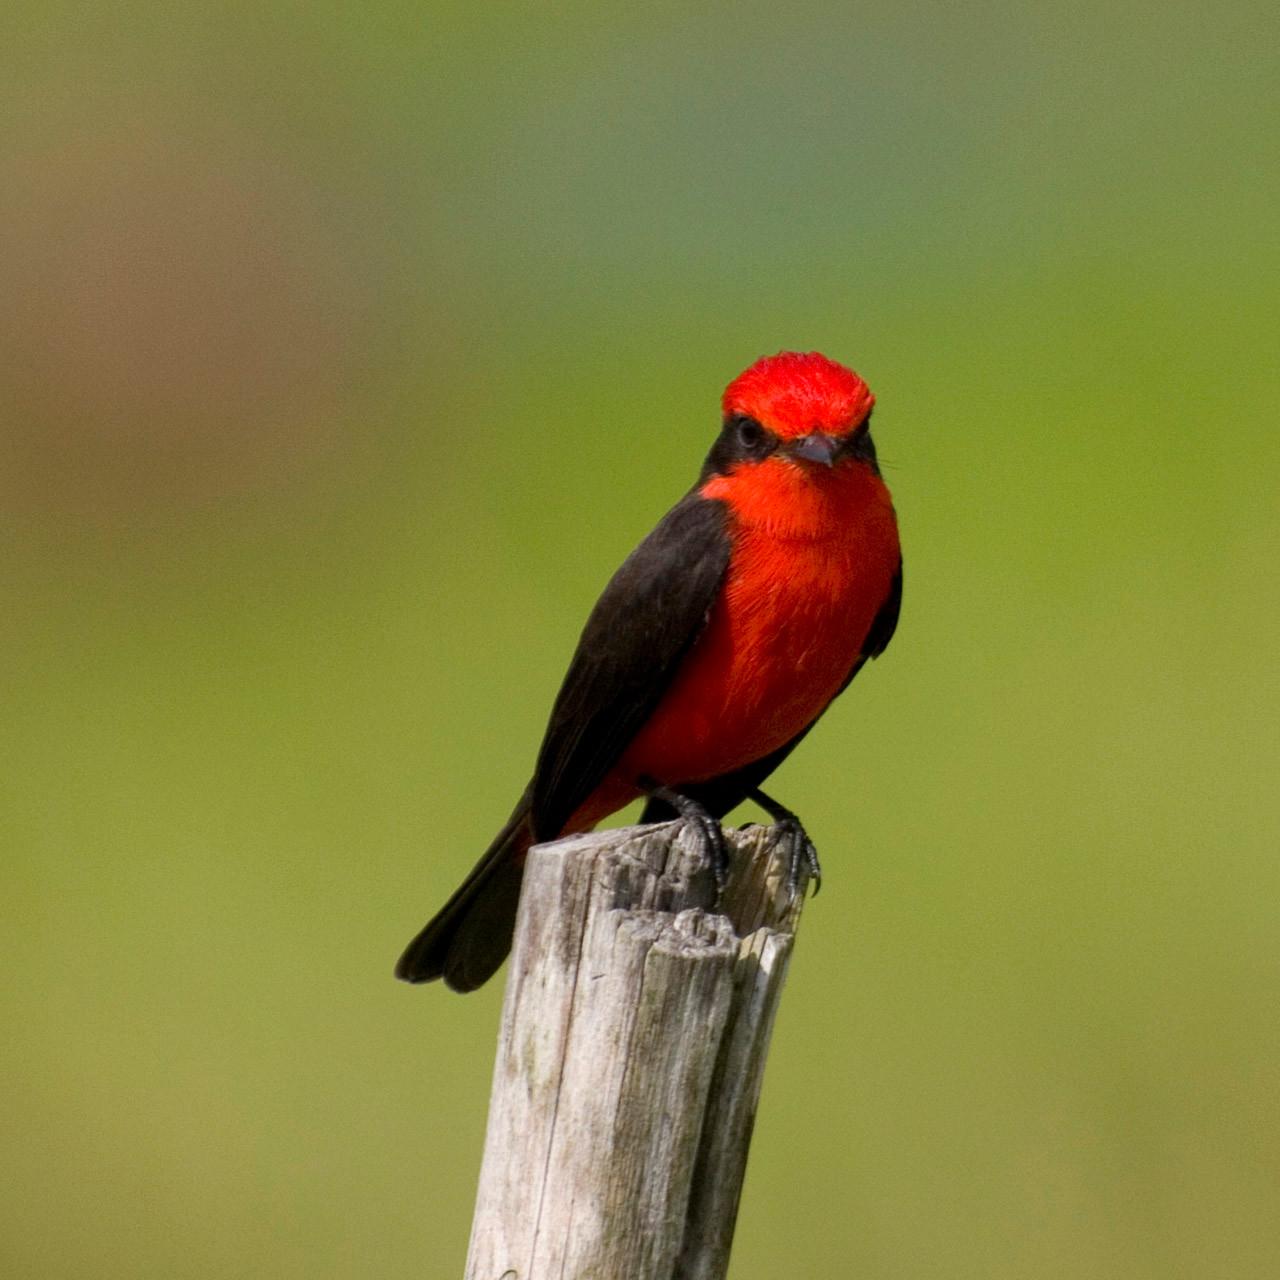 Black-necked red cotinga (Phoenicircus nigricollis) [Venezuela, 2009]